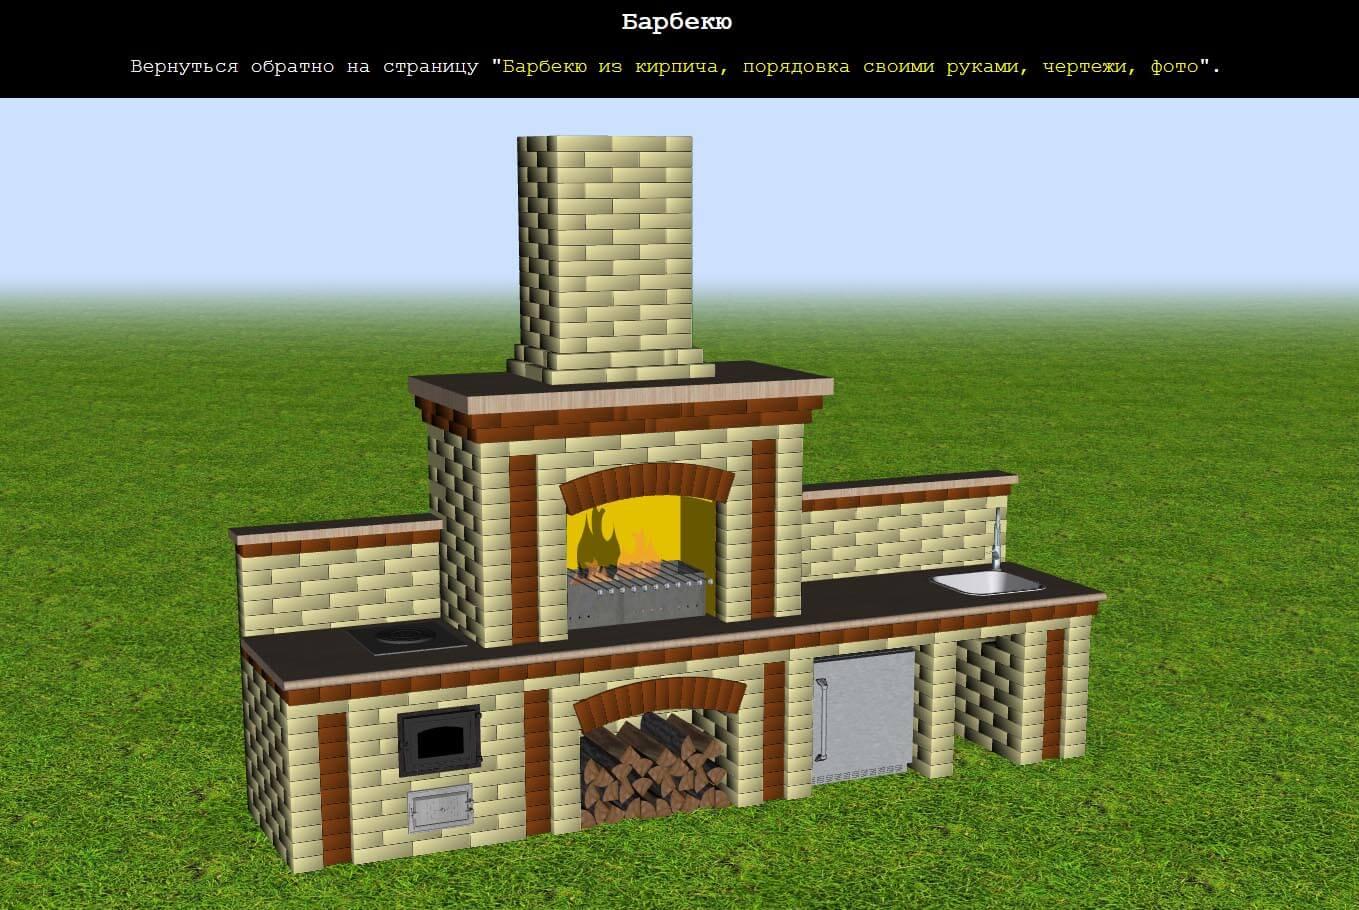 3d модель барбекю из кирпича